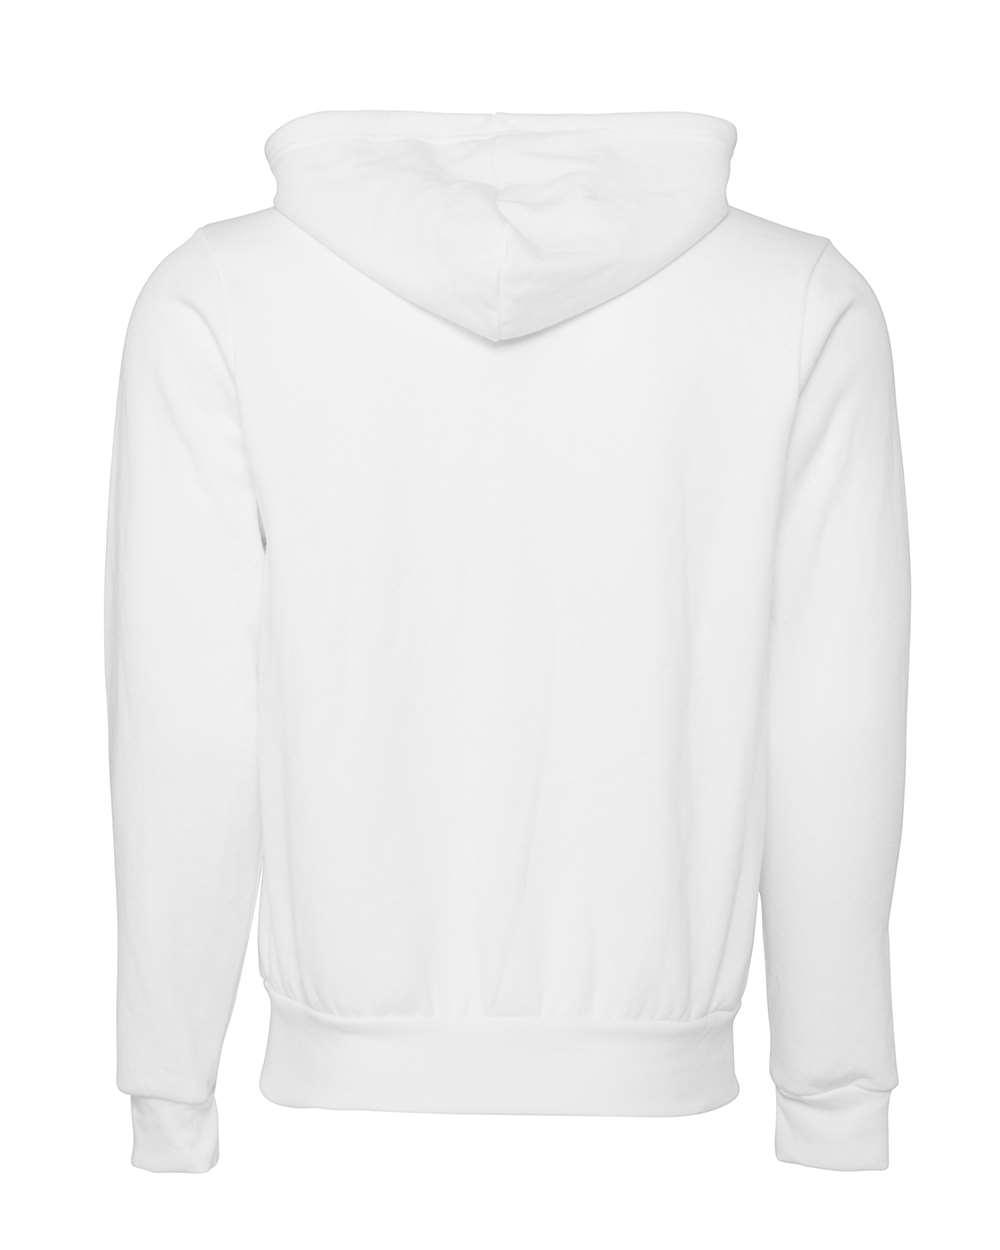 Bella-Canvas-Unisex-Full-Zip-Up-Hooded-Sweatshirt-Blank-Hoodie-3739-up-to-3XL thumbnail 29